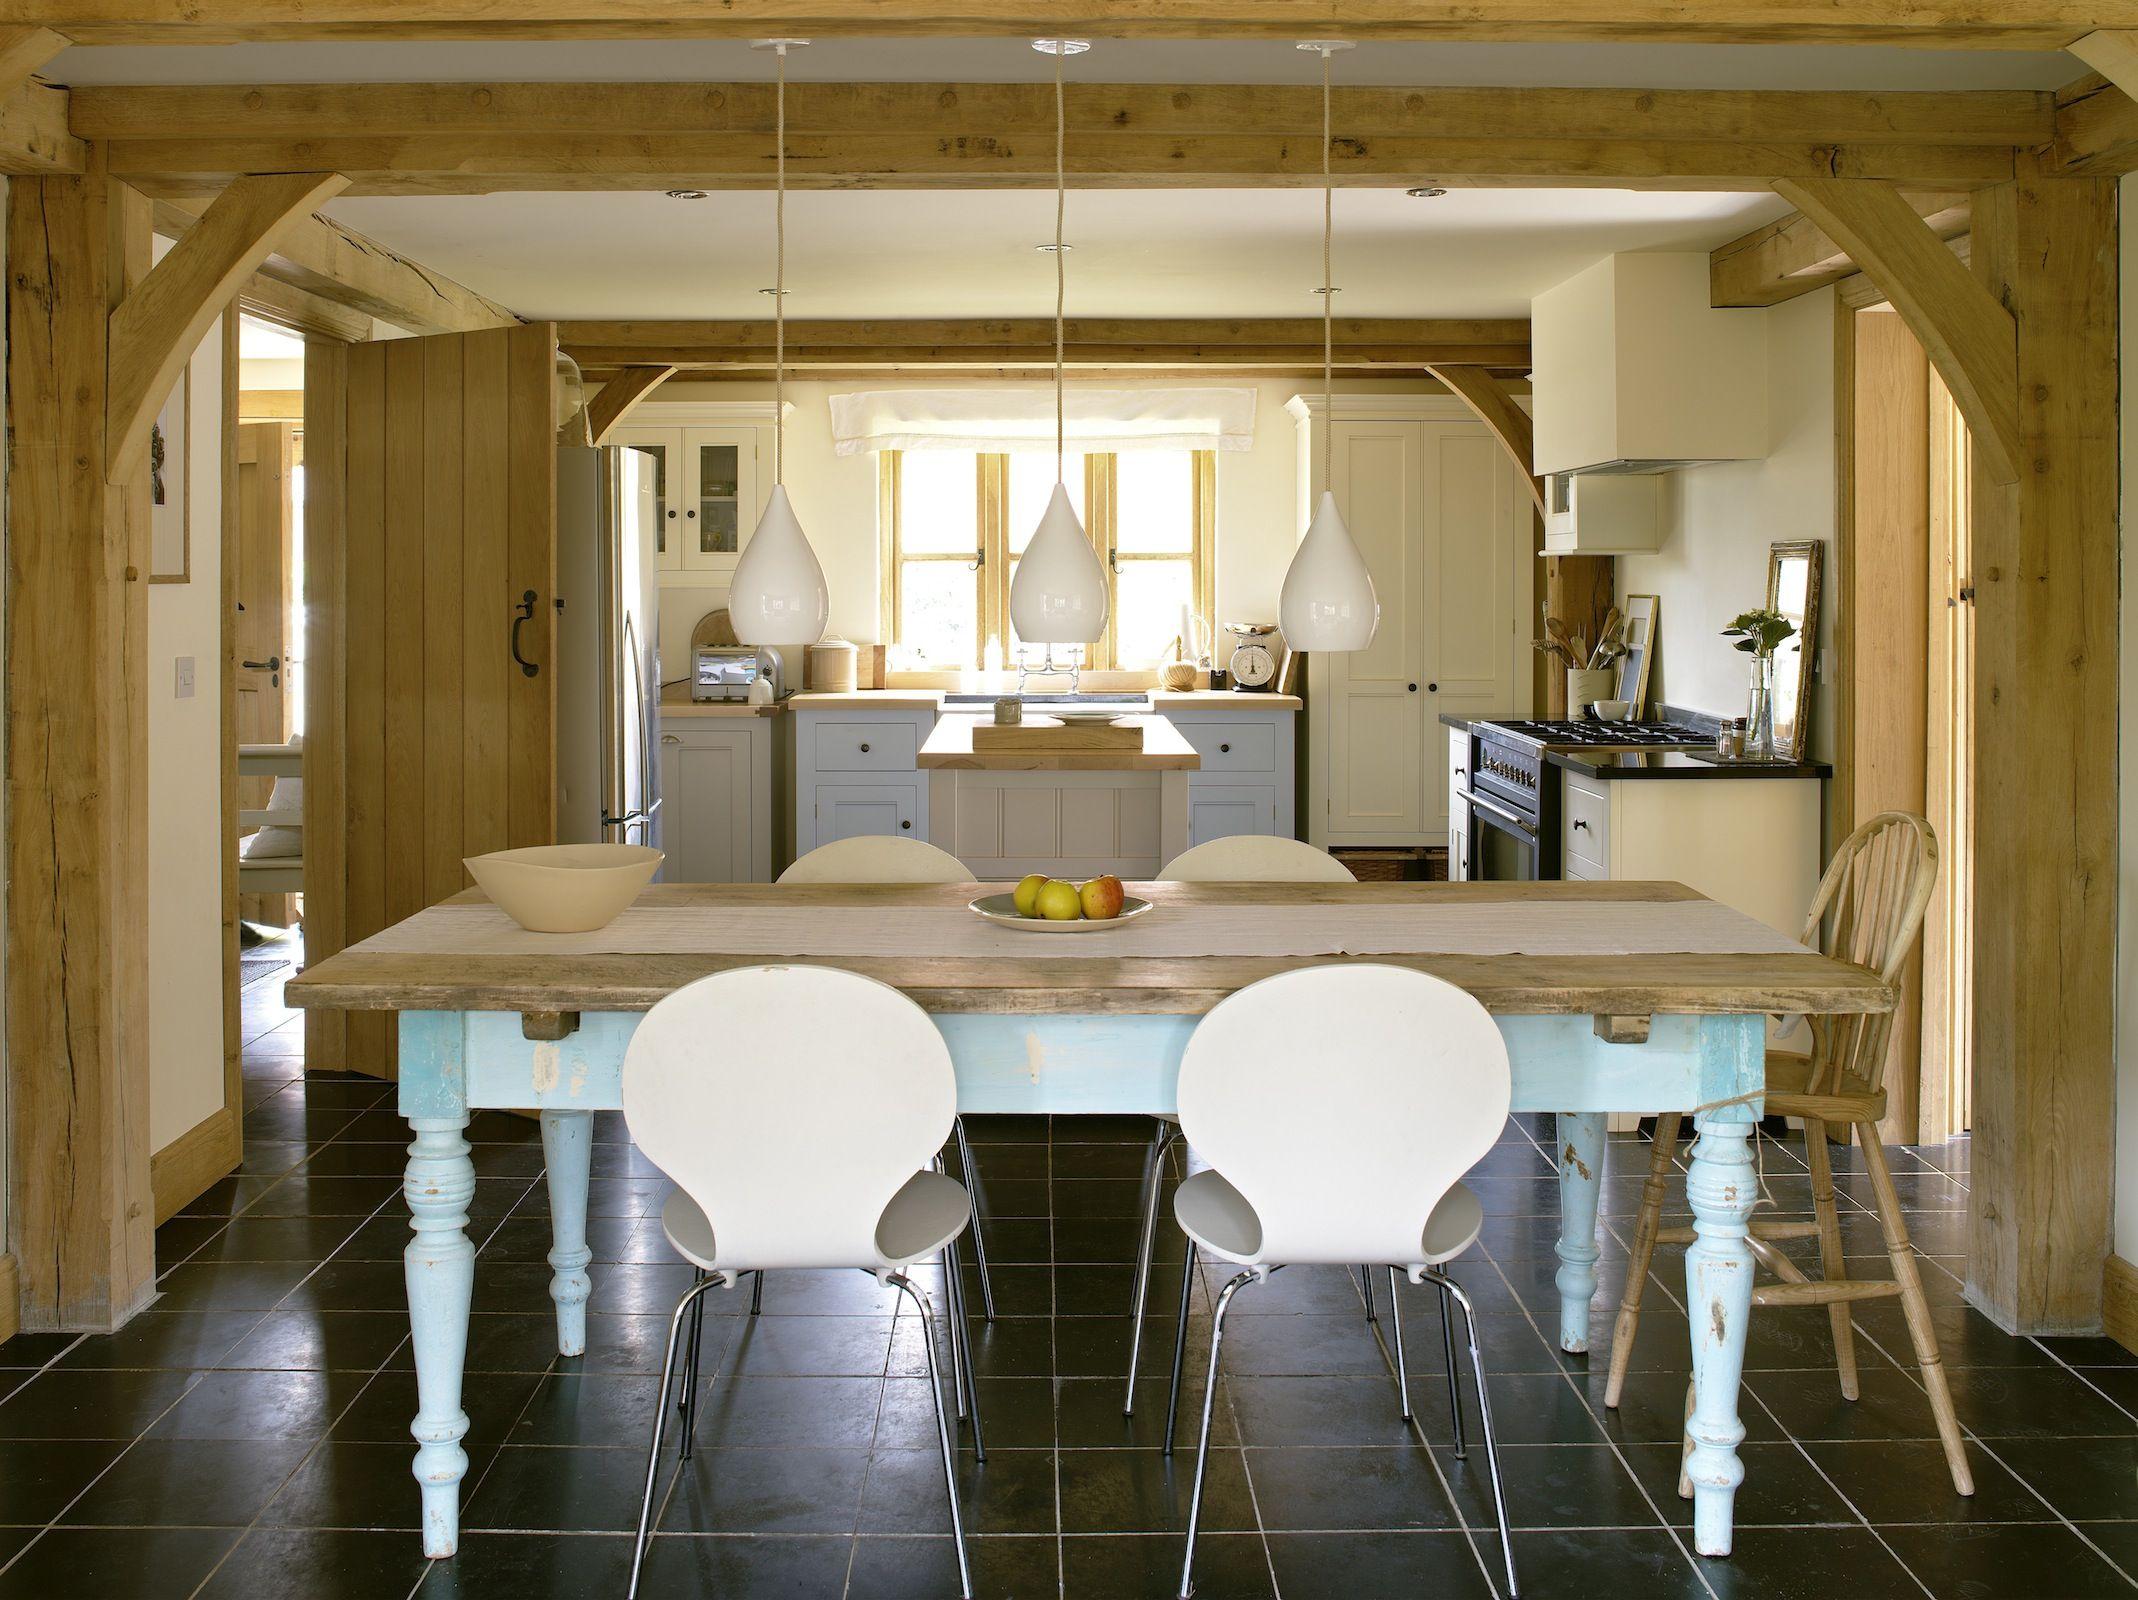 Border Oak - Pearmain Cottage Kitchen. | Dream home | Pinterest ...